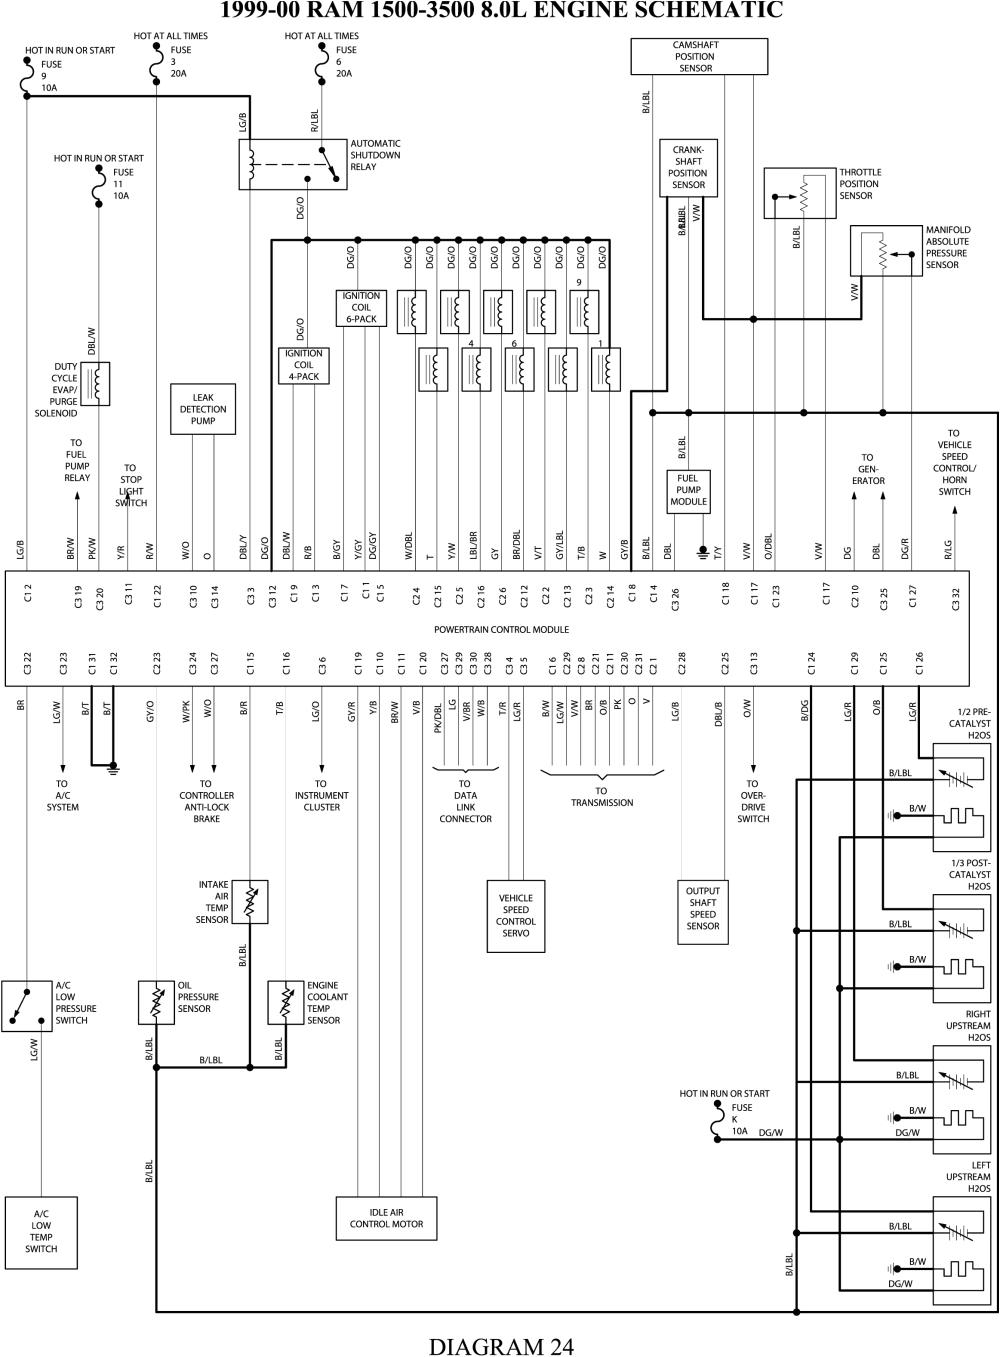 1999 dodge ram 2500 wiring diagram